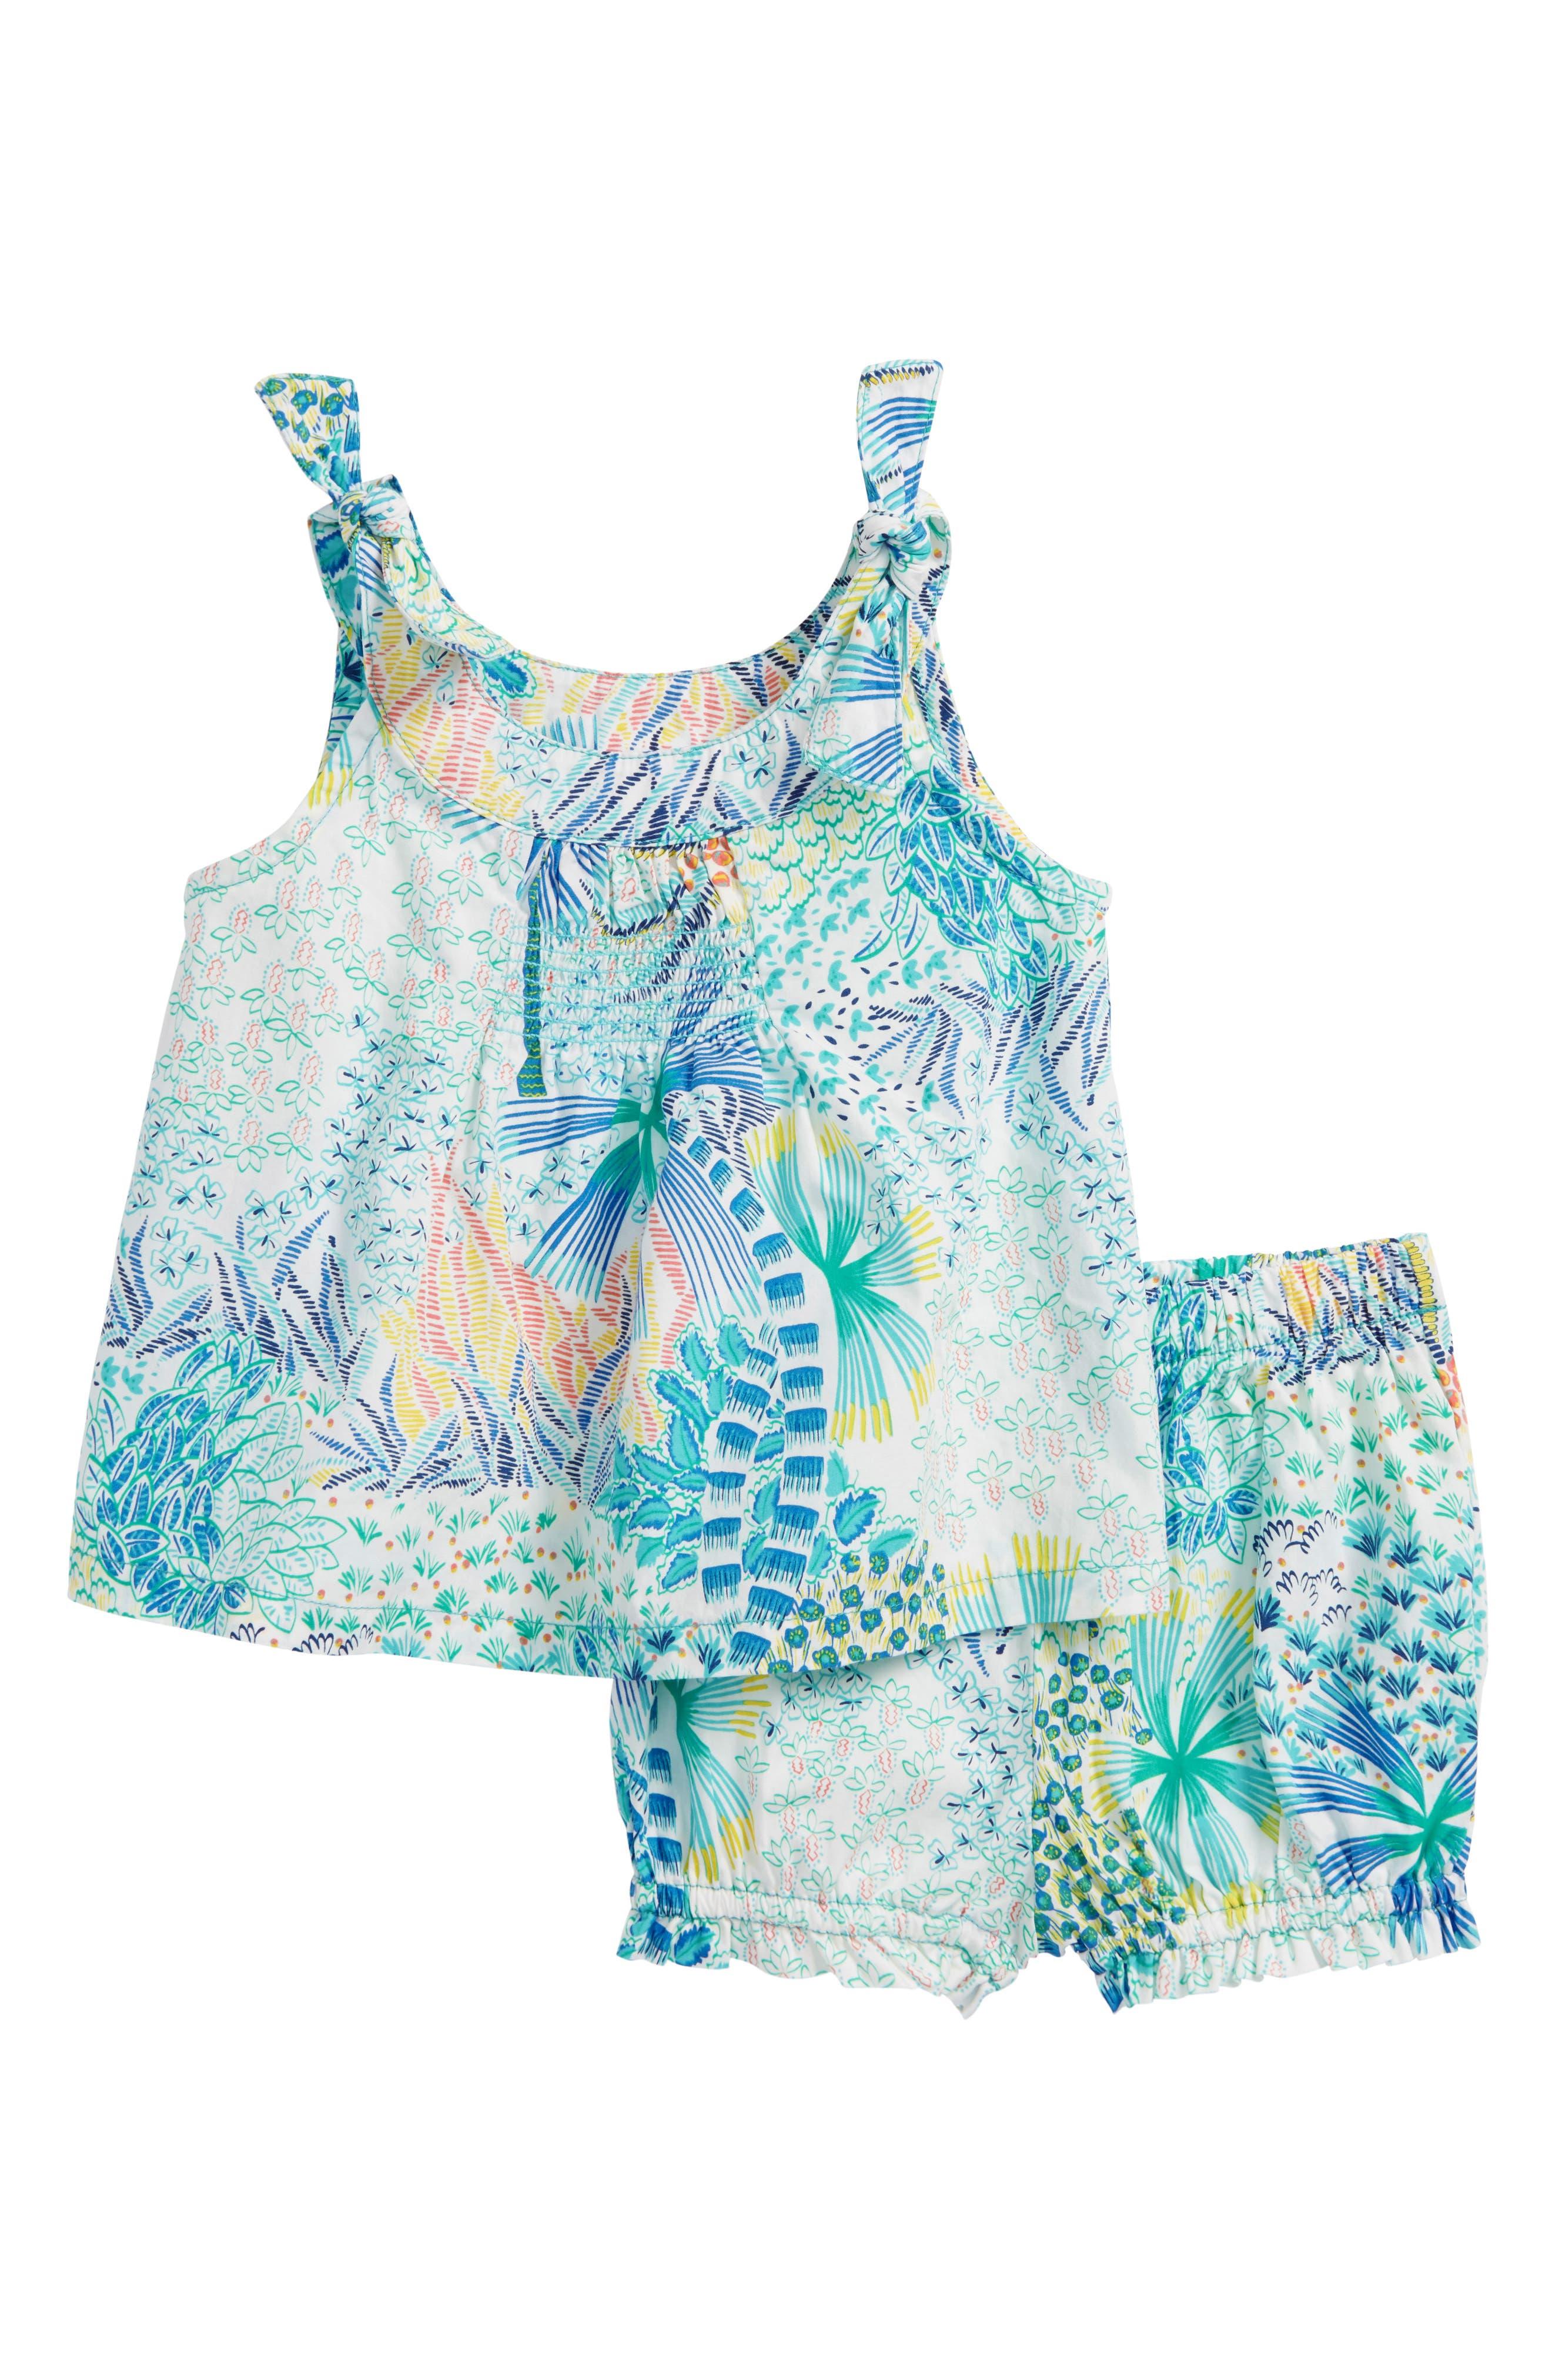 Tropical Floral Top & Shorts Set,                             Main thumbnail 1, color,                             Tropical Palms